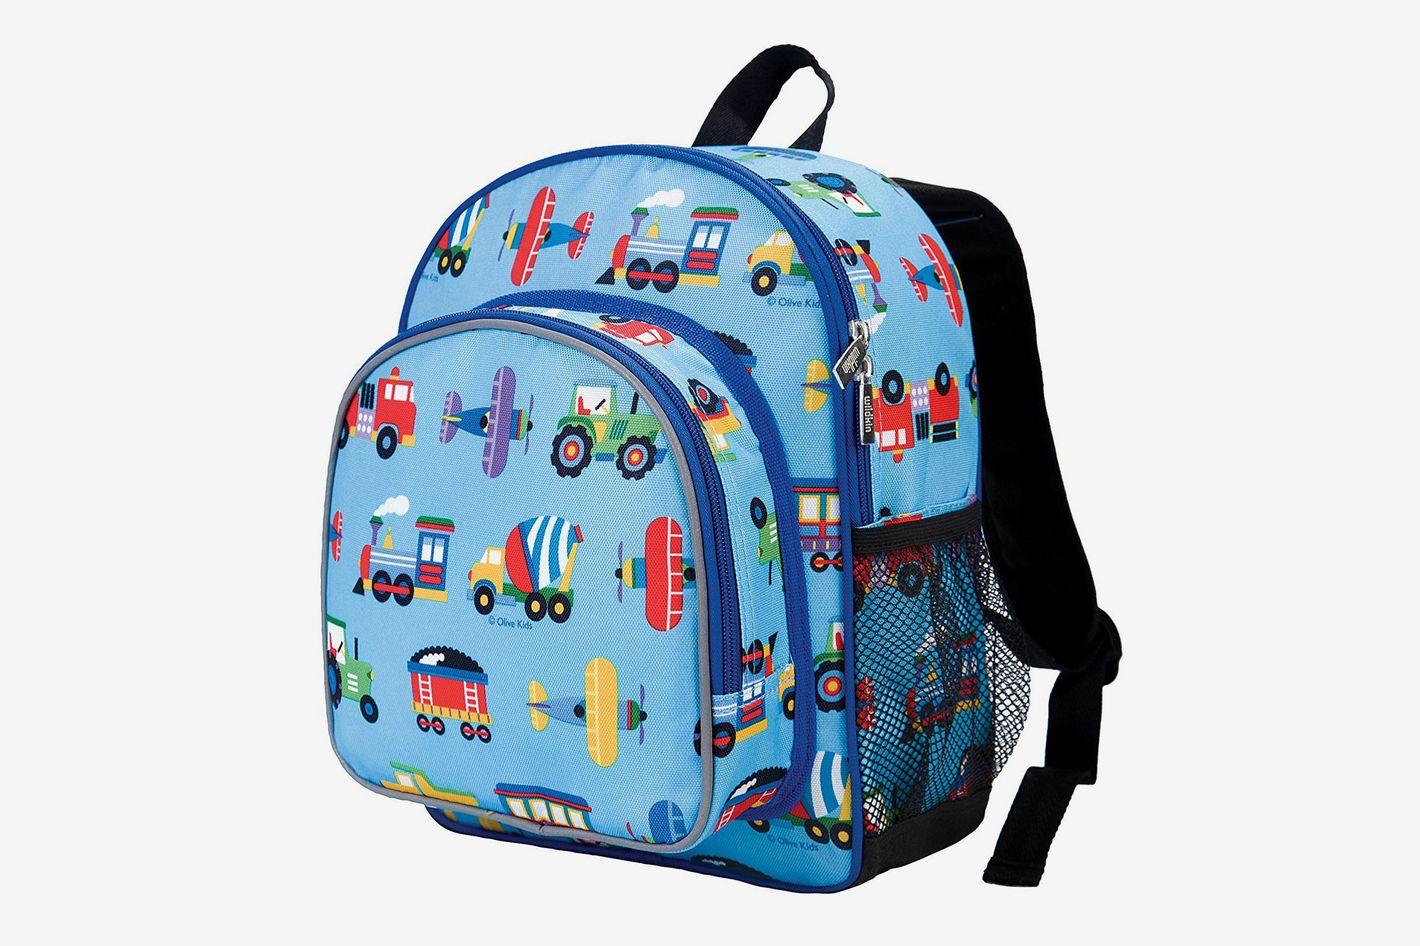 Wildkin 12-Inch Backpack